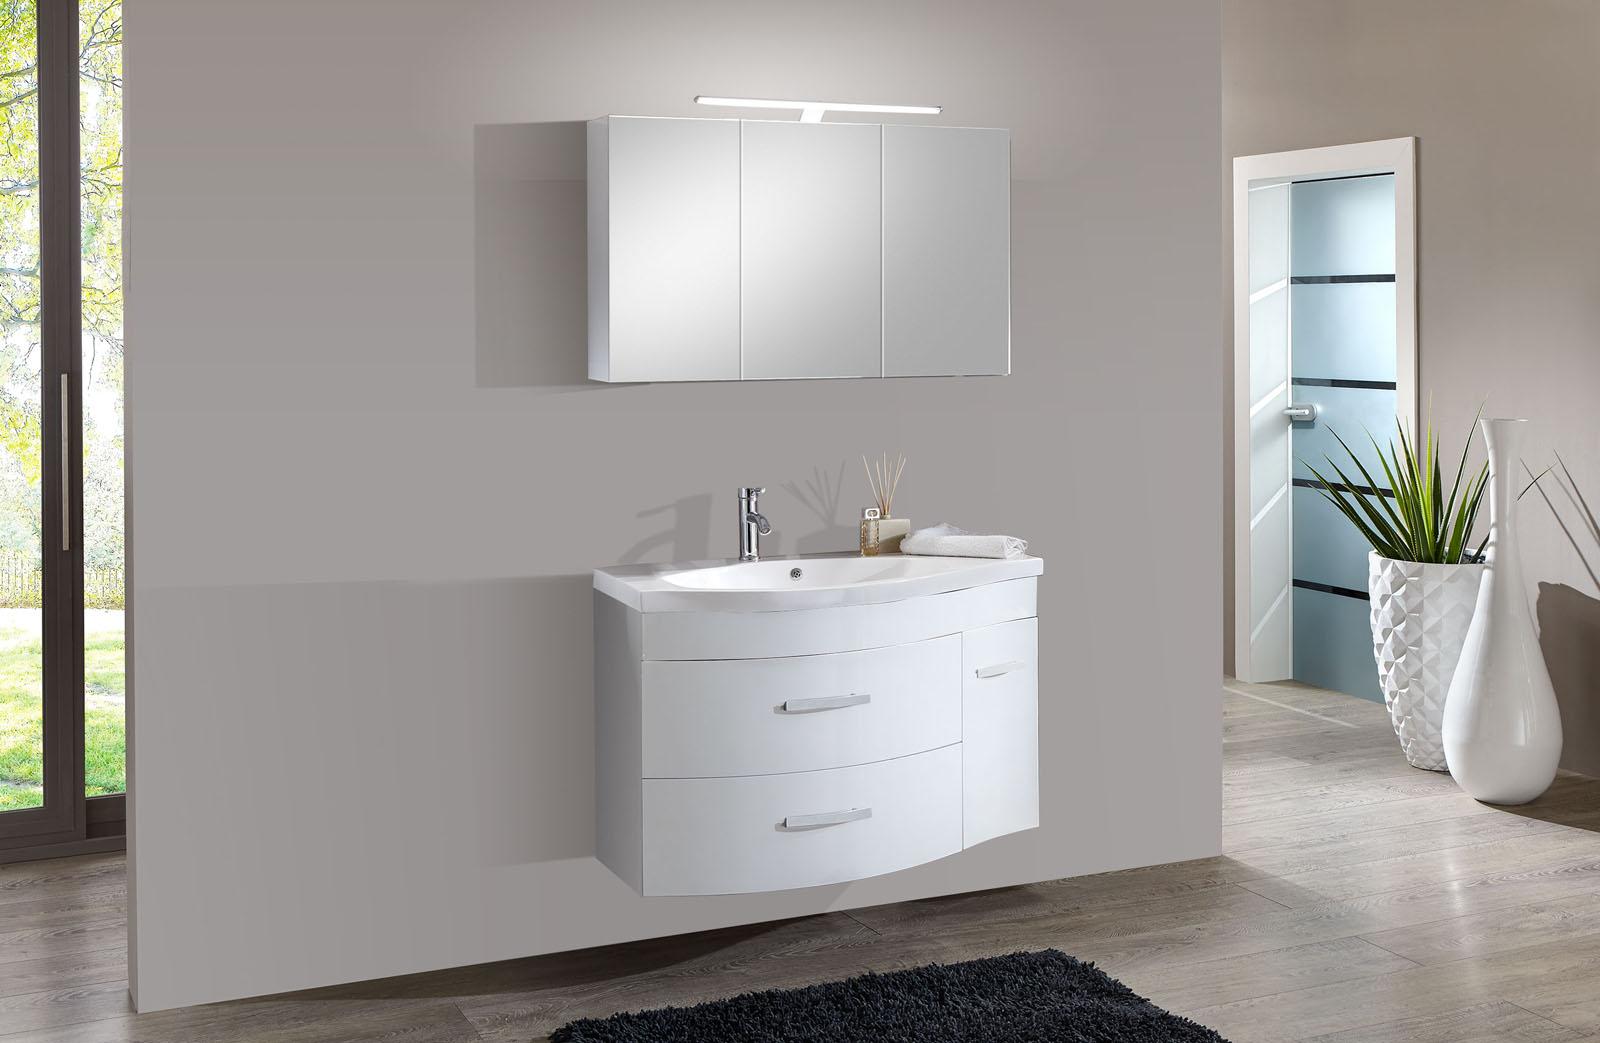 sam 2tlg badezimmer set hochglanz wei 110cm lugano. Black Bedroom Furniture Sets. Home Design Ideas